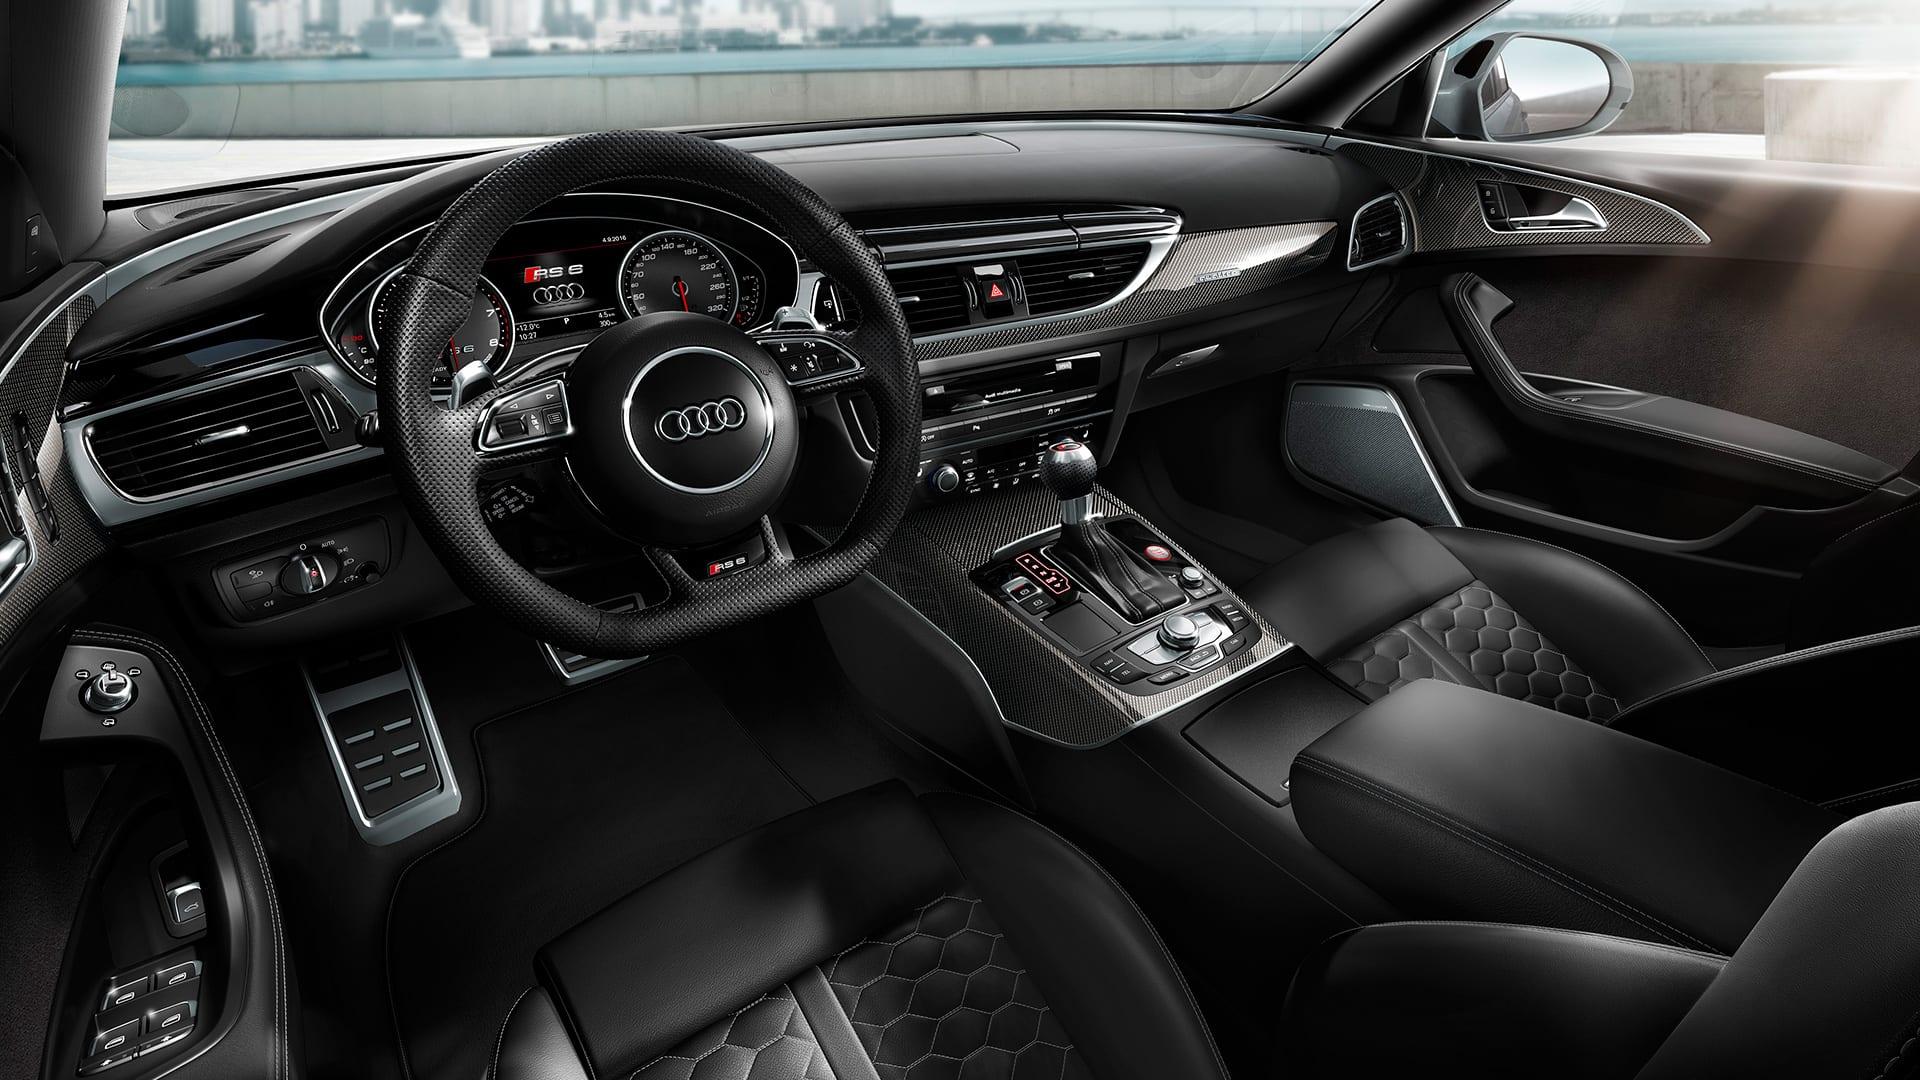 Rs 6 Avant Gt Audi Deutschland